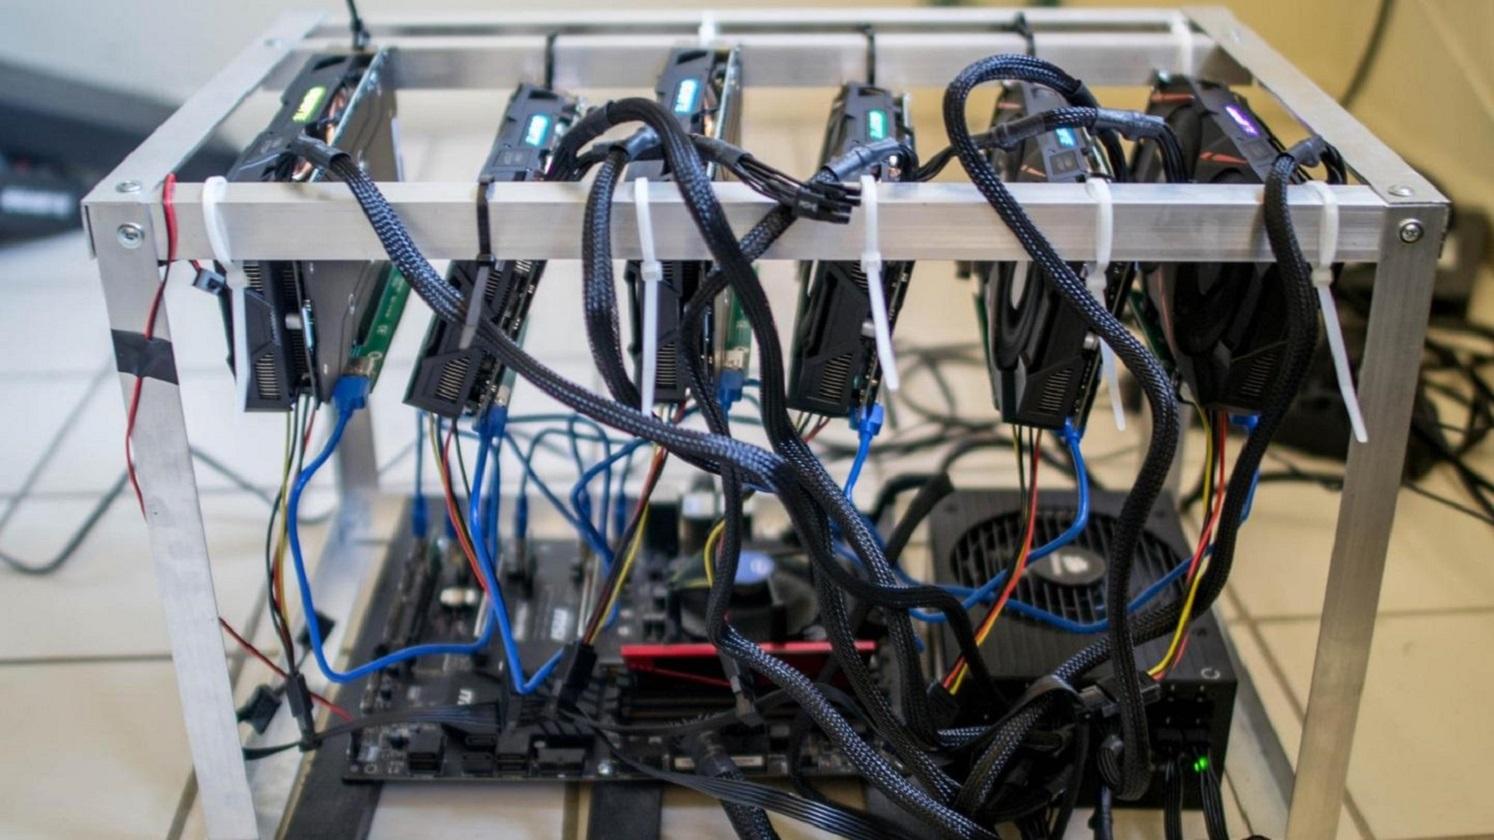 sitco bitcoin está investindo? a diferença entre investir e minerar bitcoin